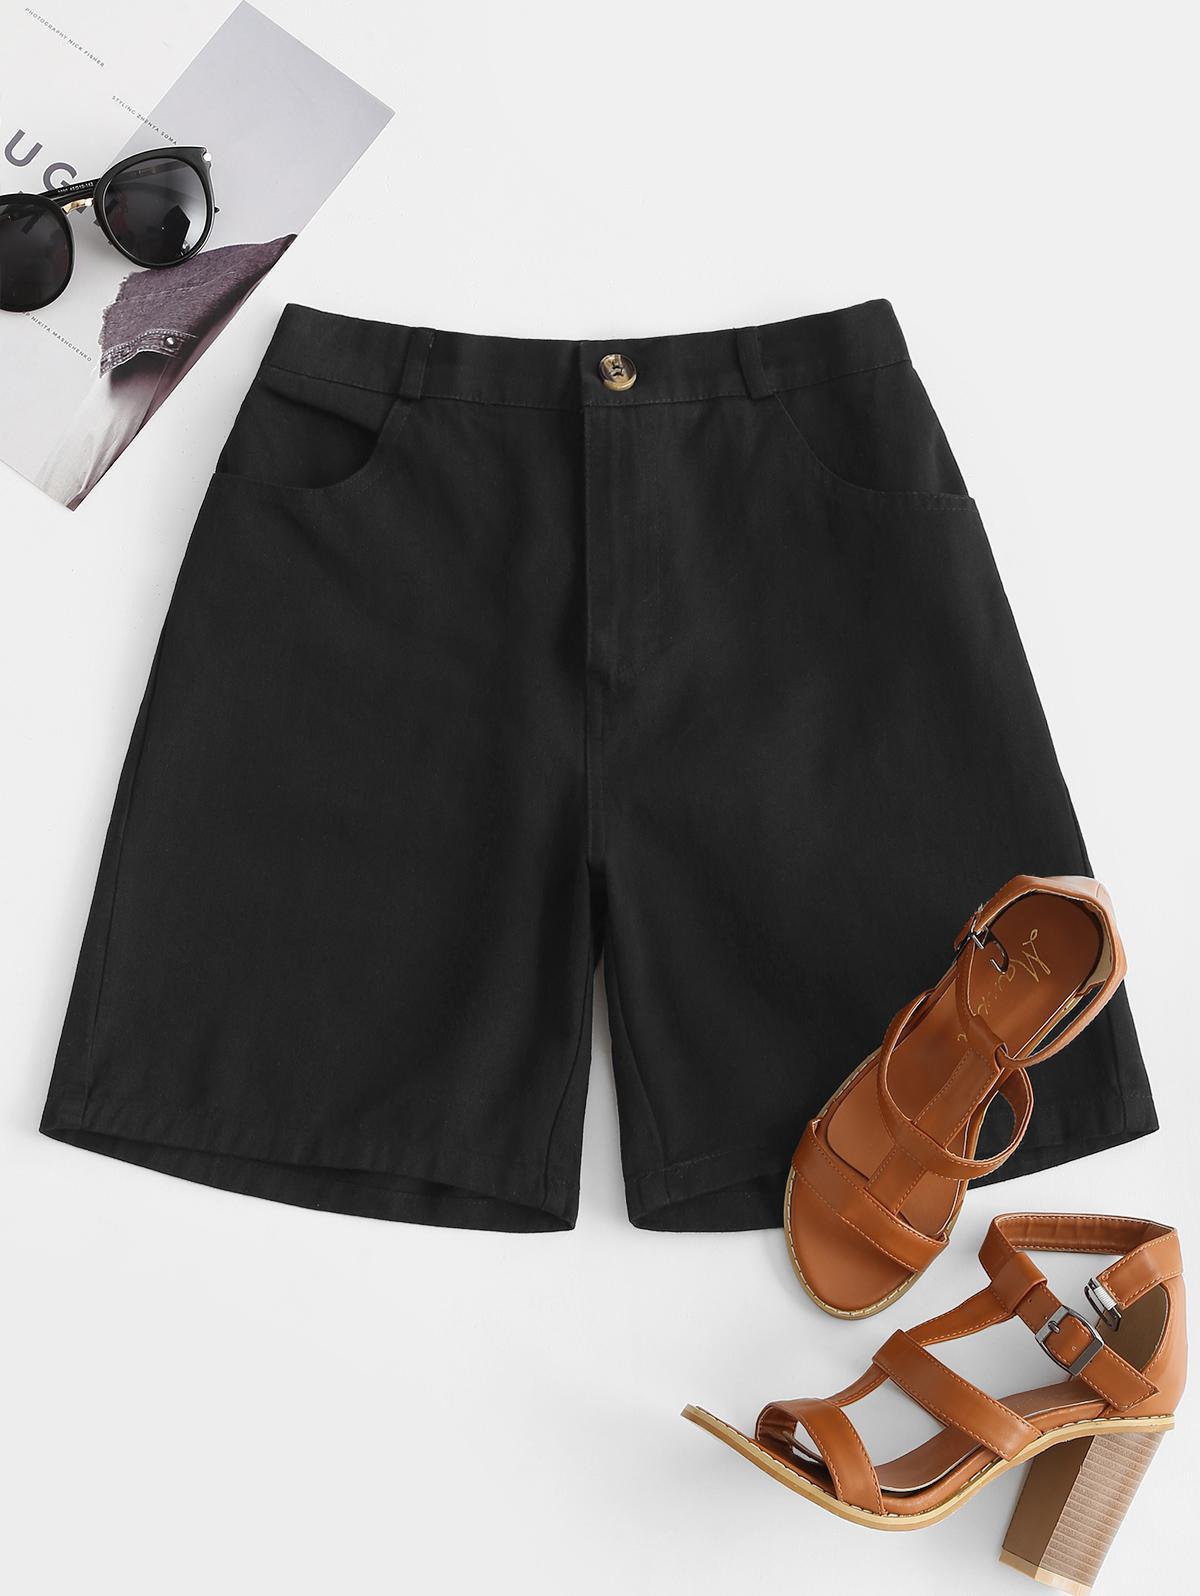 High Rise Zip Fly Pocket Bermuda Shorts